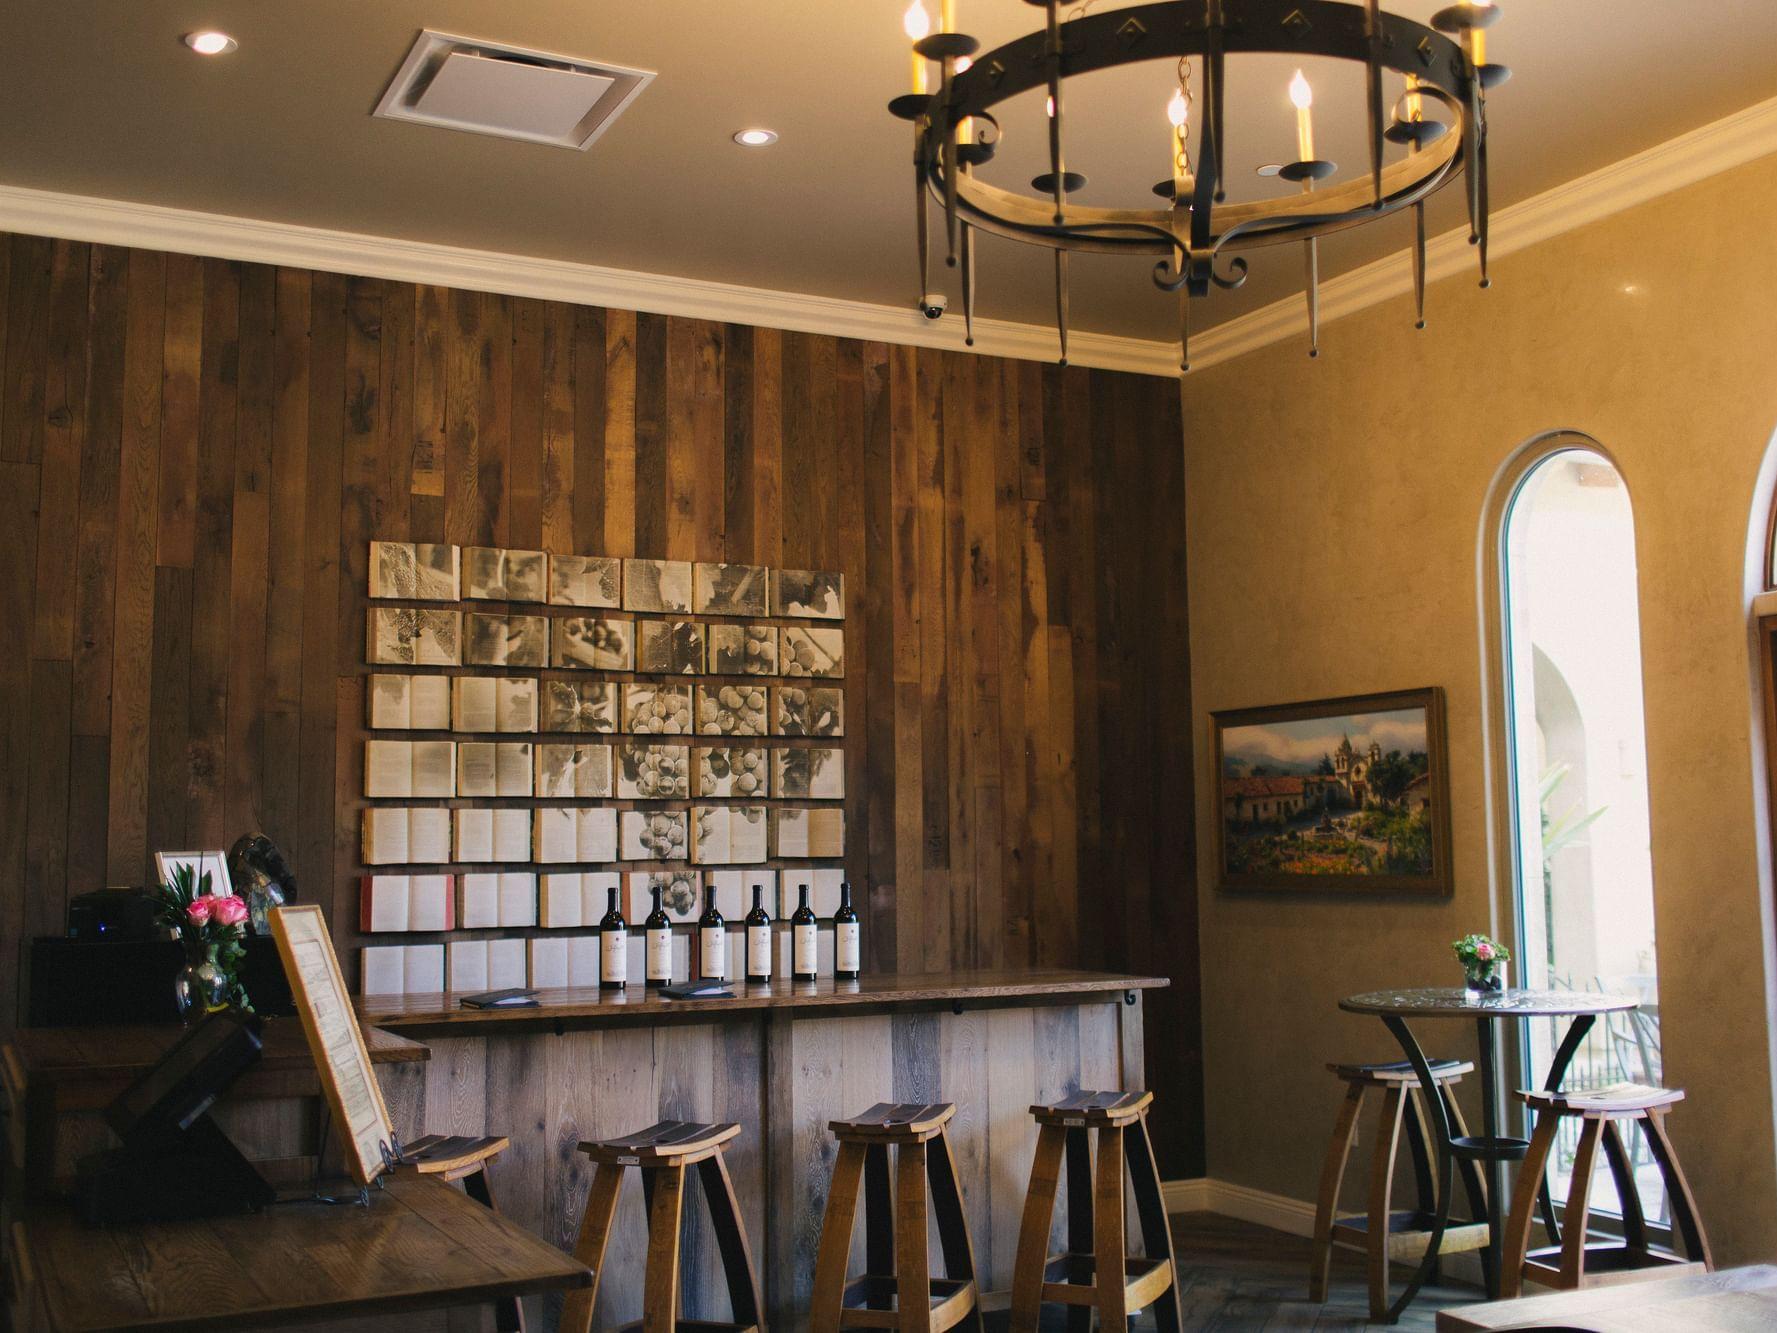 Willow Creek wine tasting room